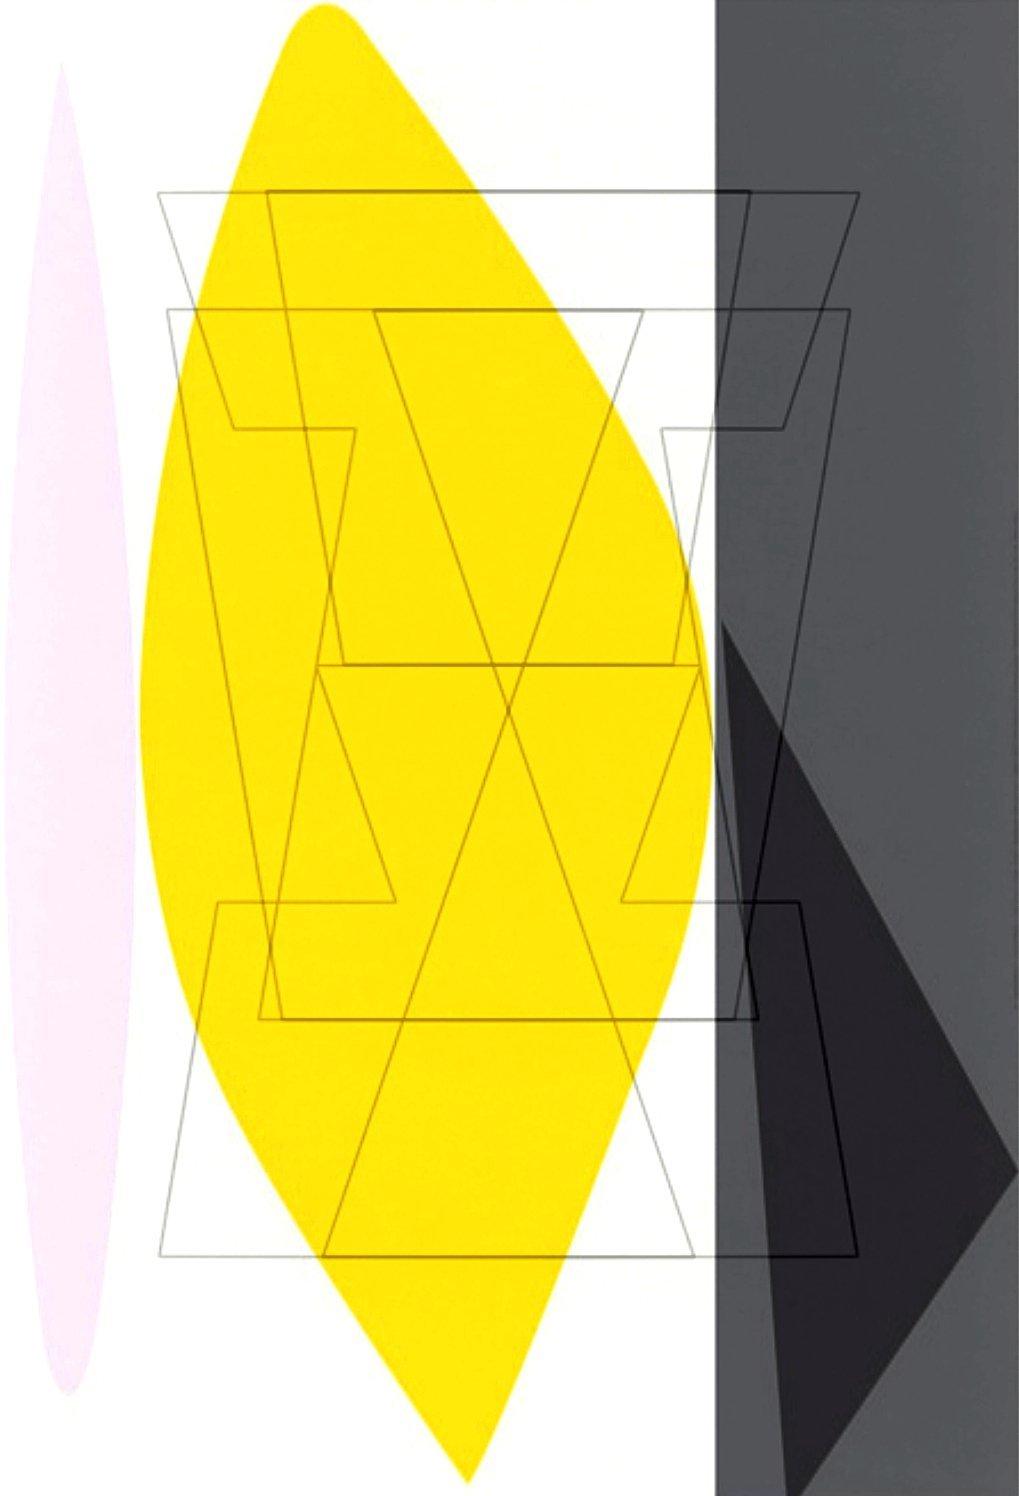 SC_07x 2 inverse merge tri.jpg